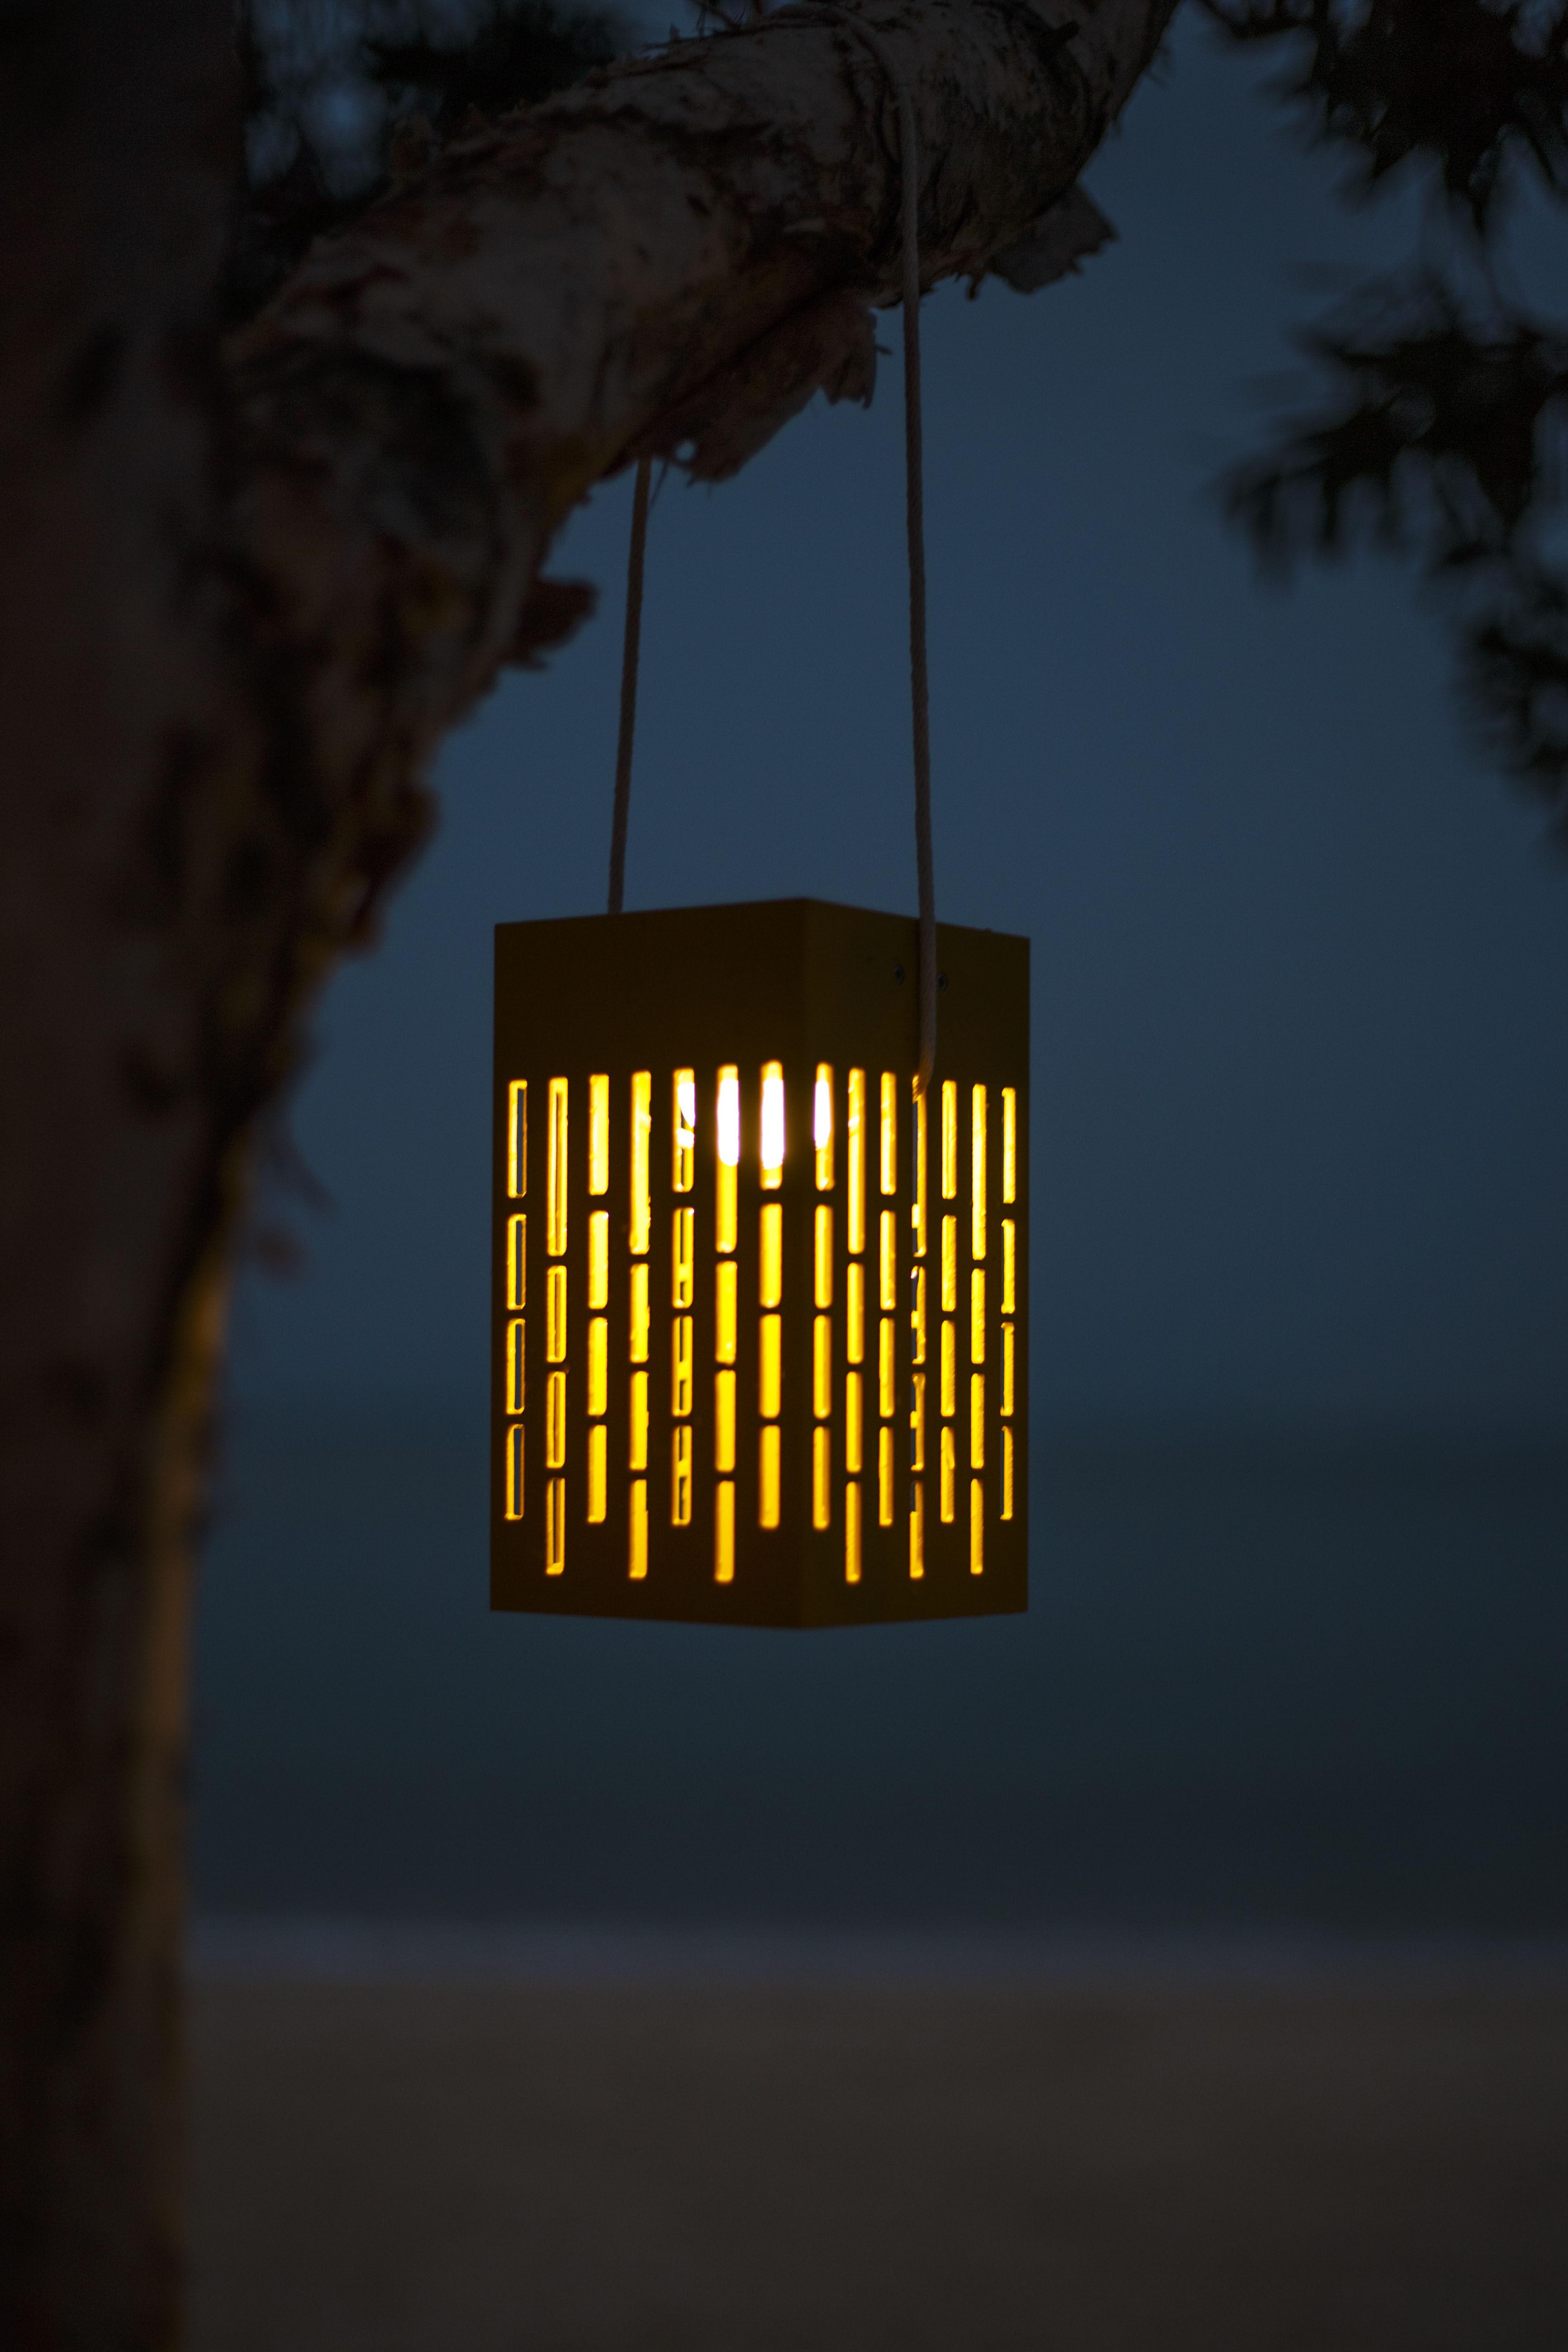 Led Maiori Pose Solaire Fil Lampe Sans La 04 Usb Dock mNOv8nw0